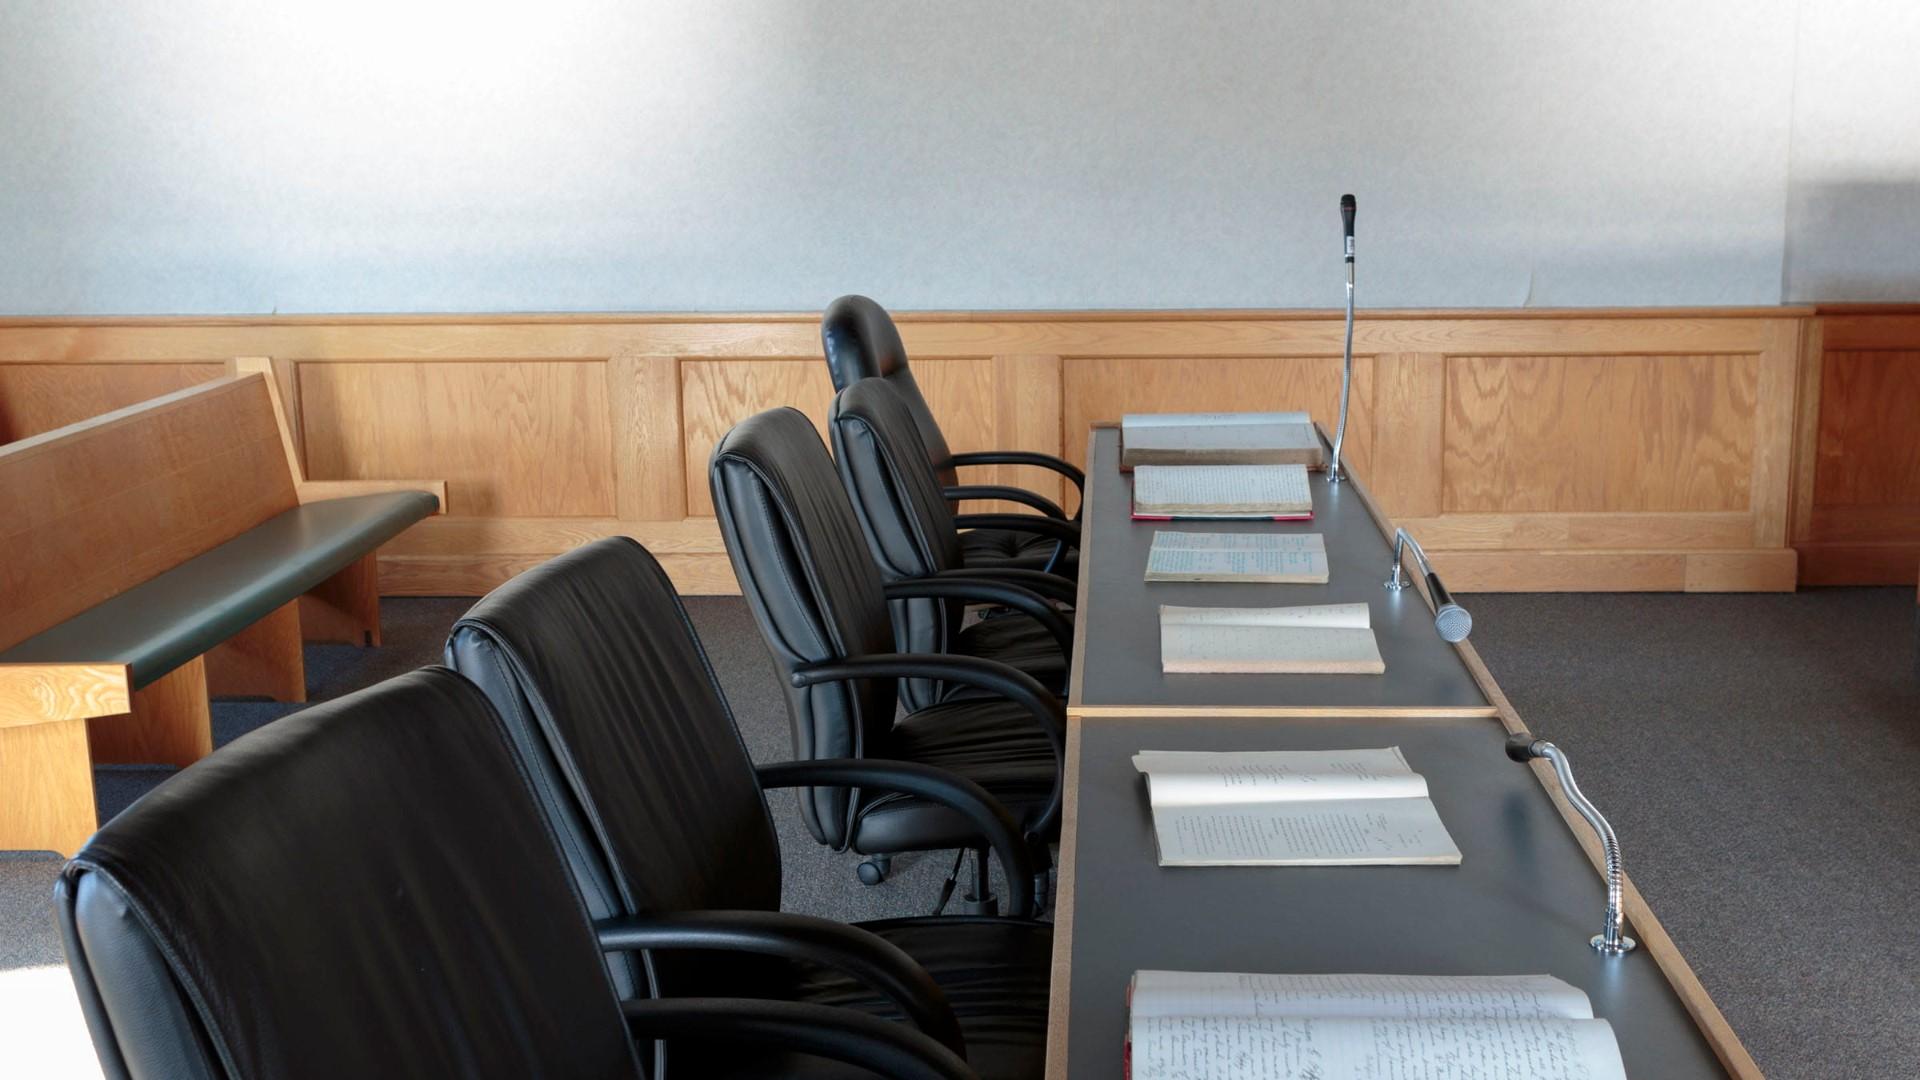 intermediaries used in criminal cases